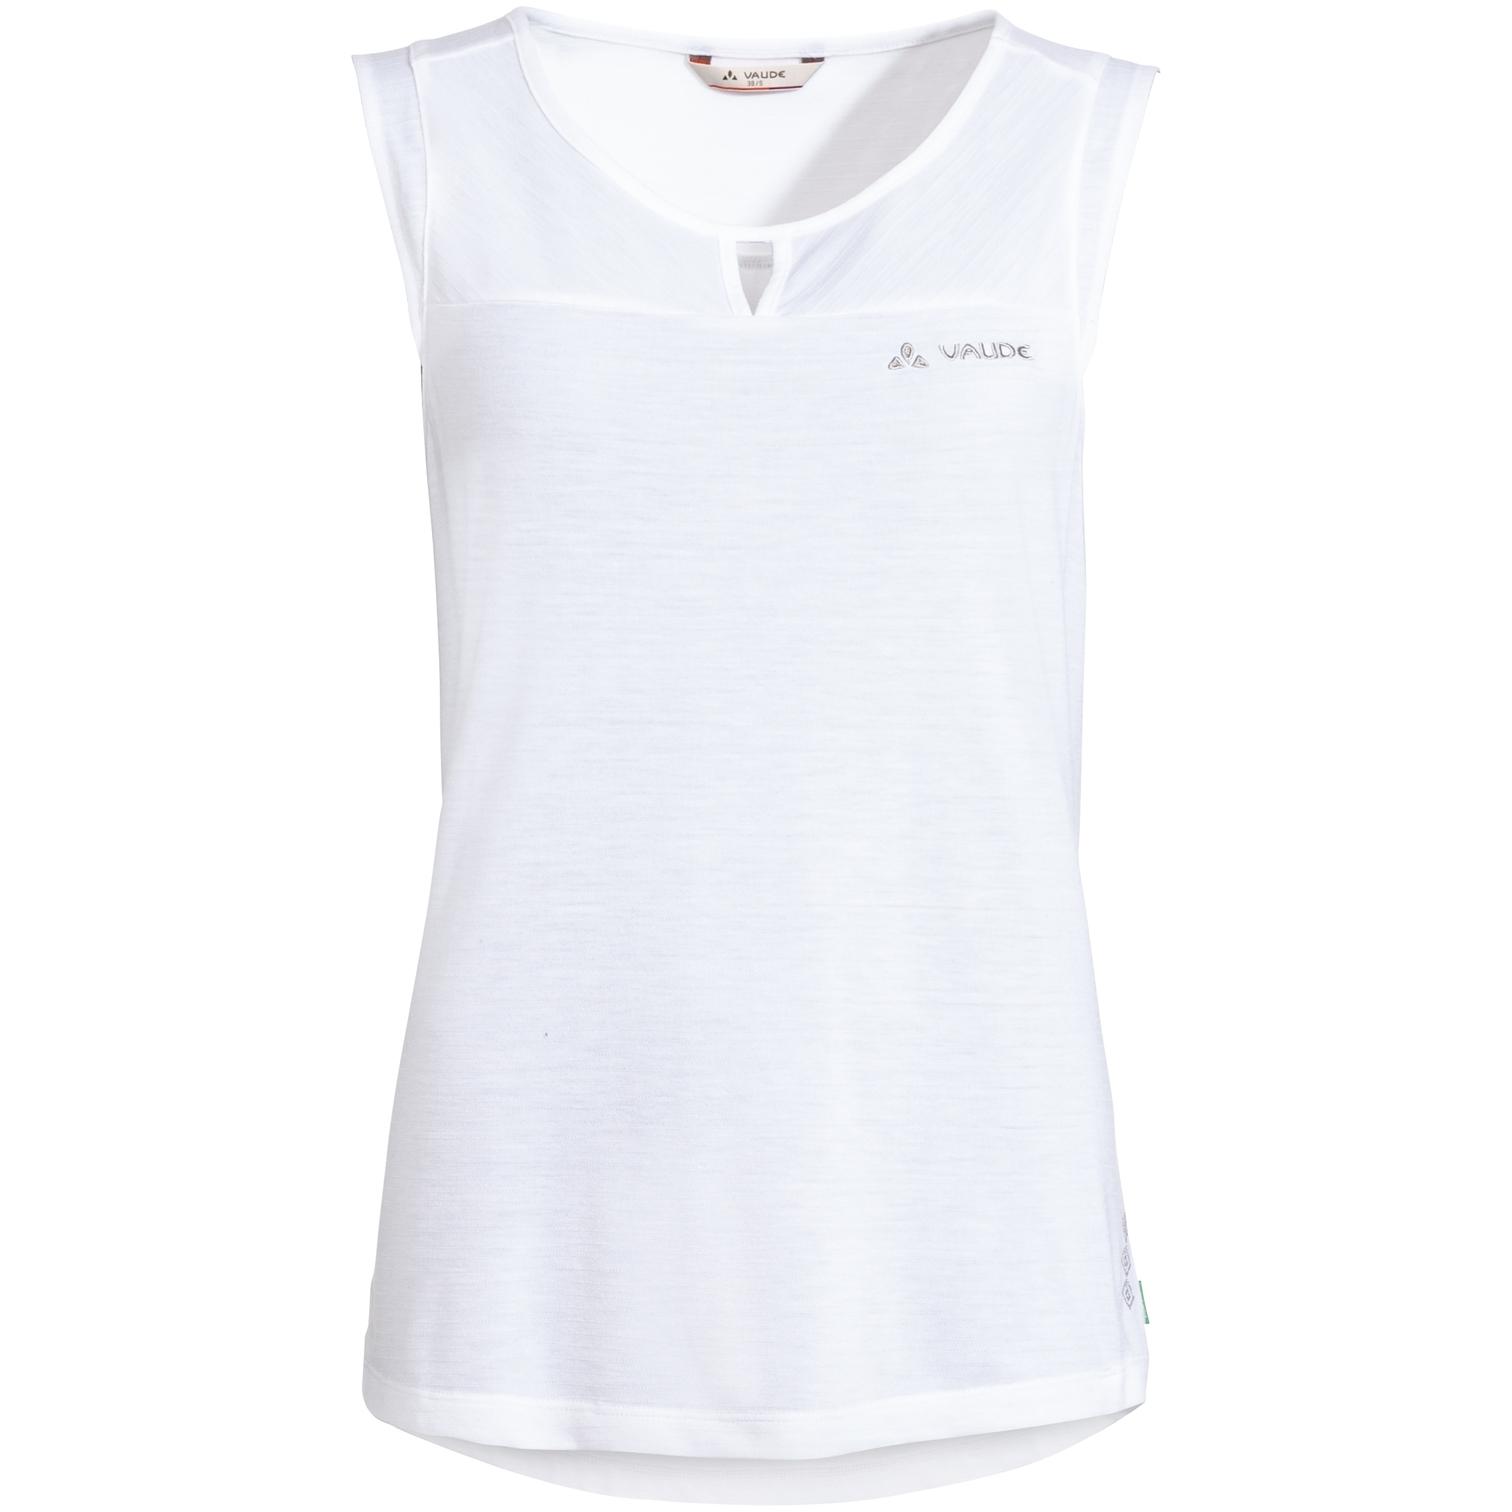 Vaude Skomer Damen Wander-Top - white